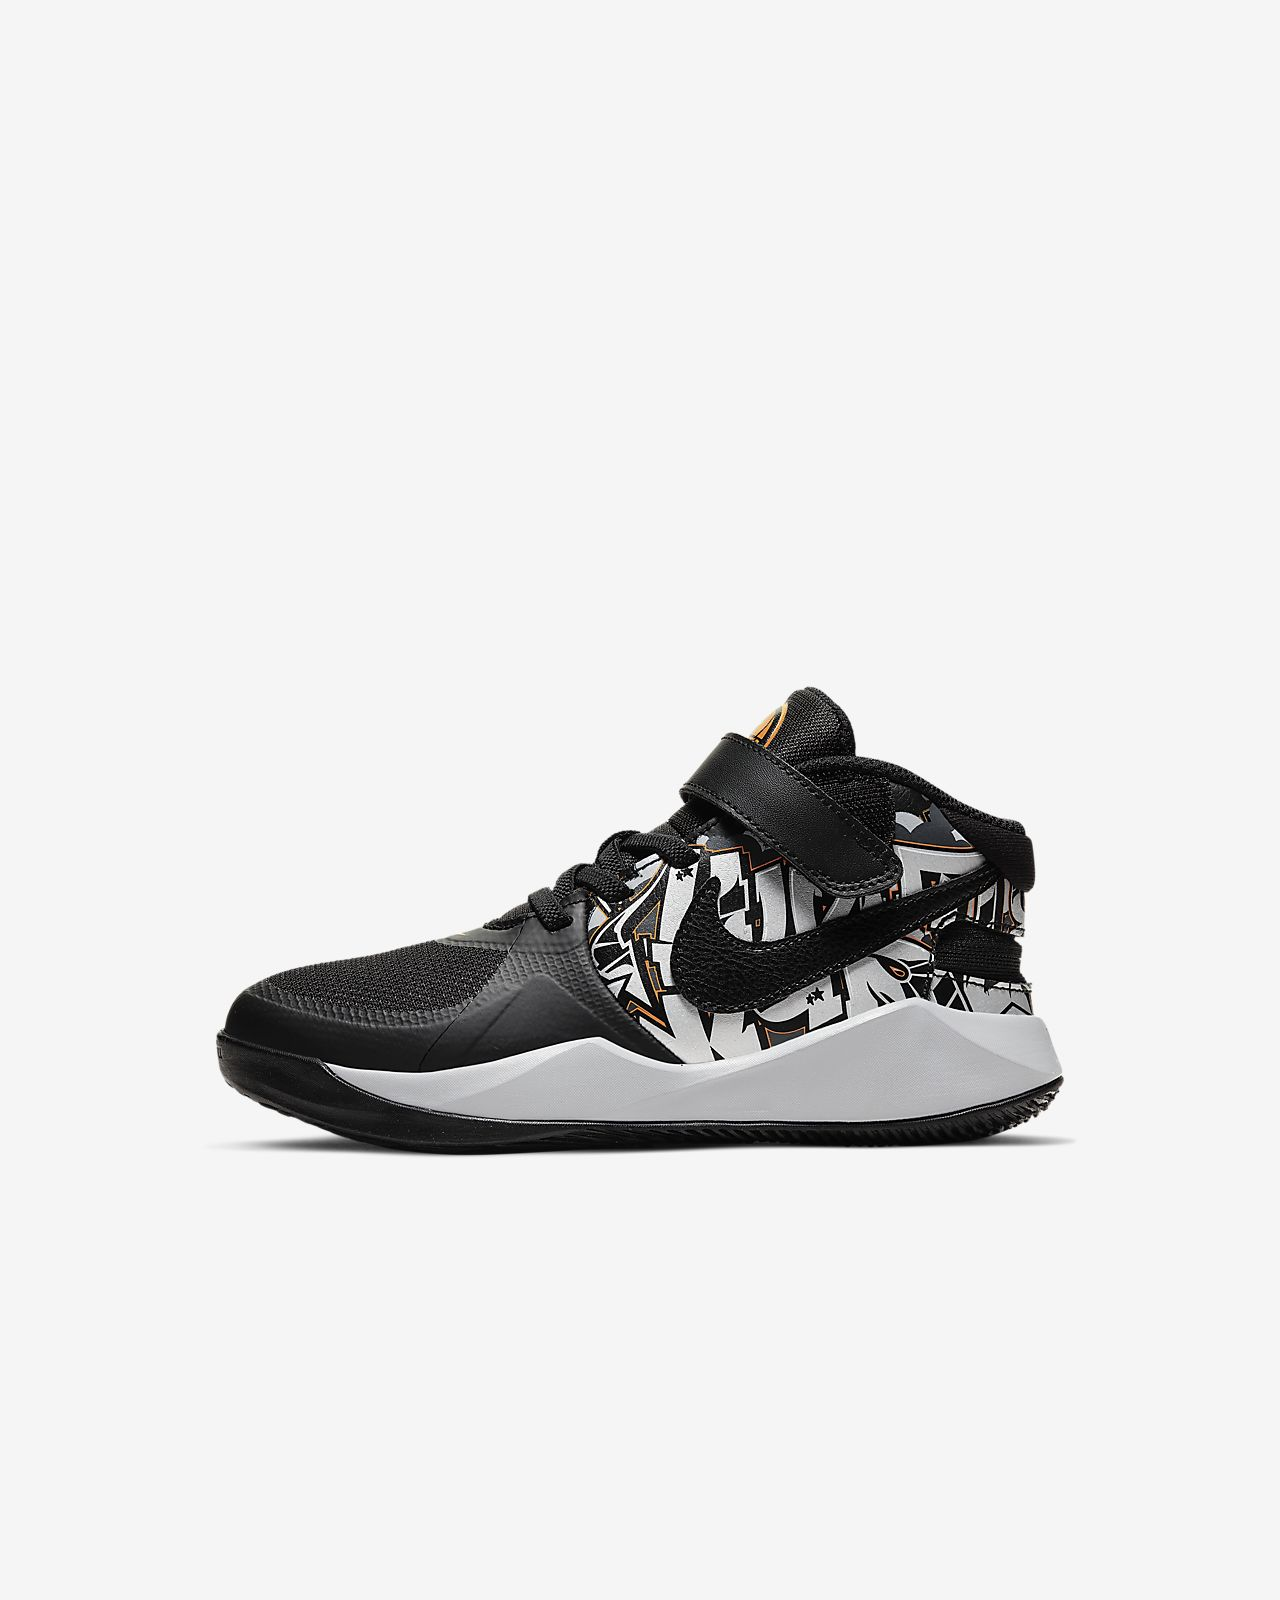 Nike Team Hustle D9 FlyEase GRFT PS 幼童运动童鞋